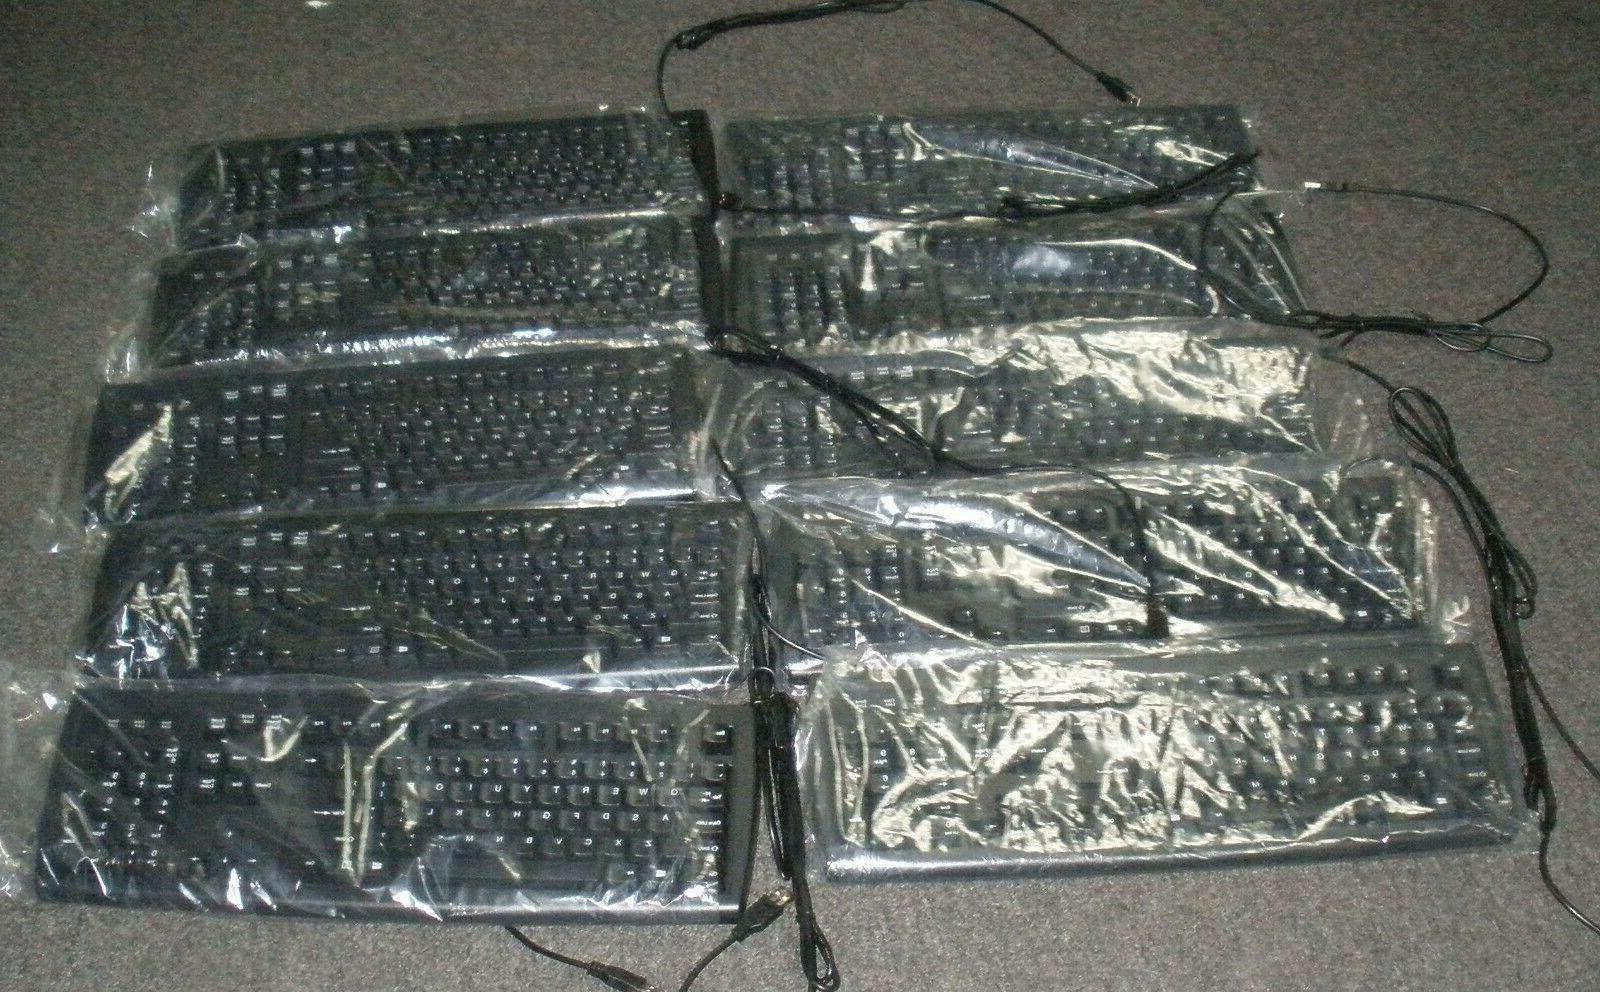 black usb us wired keyboard black usb